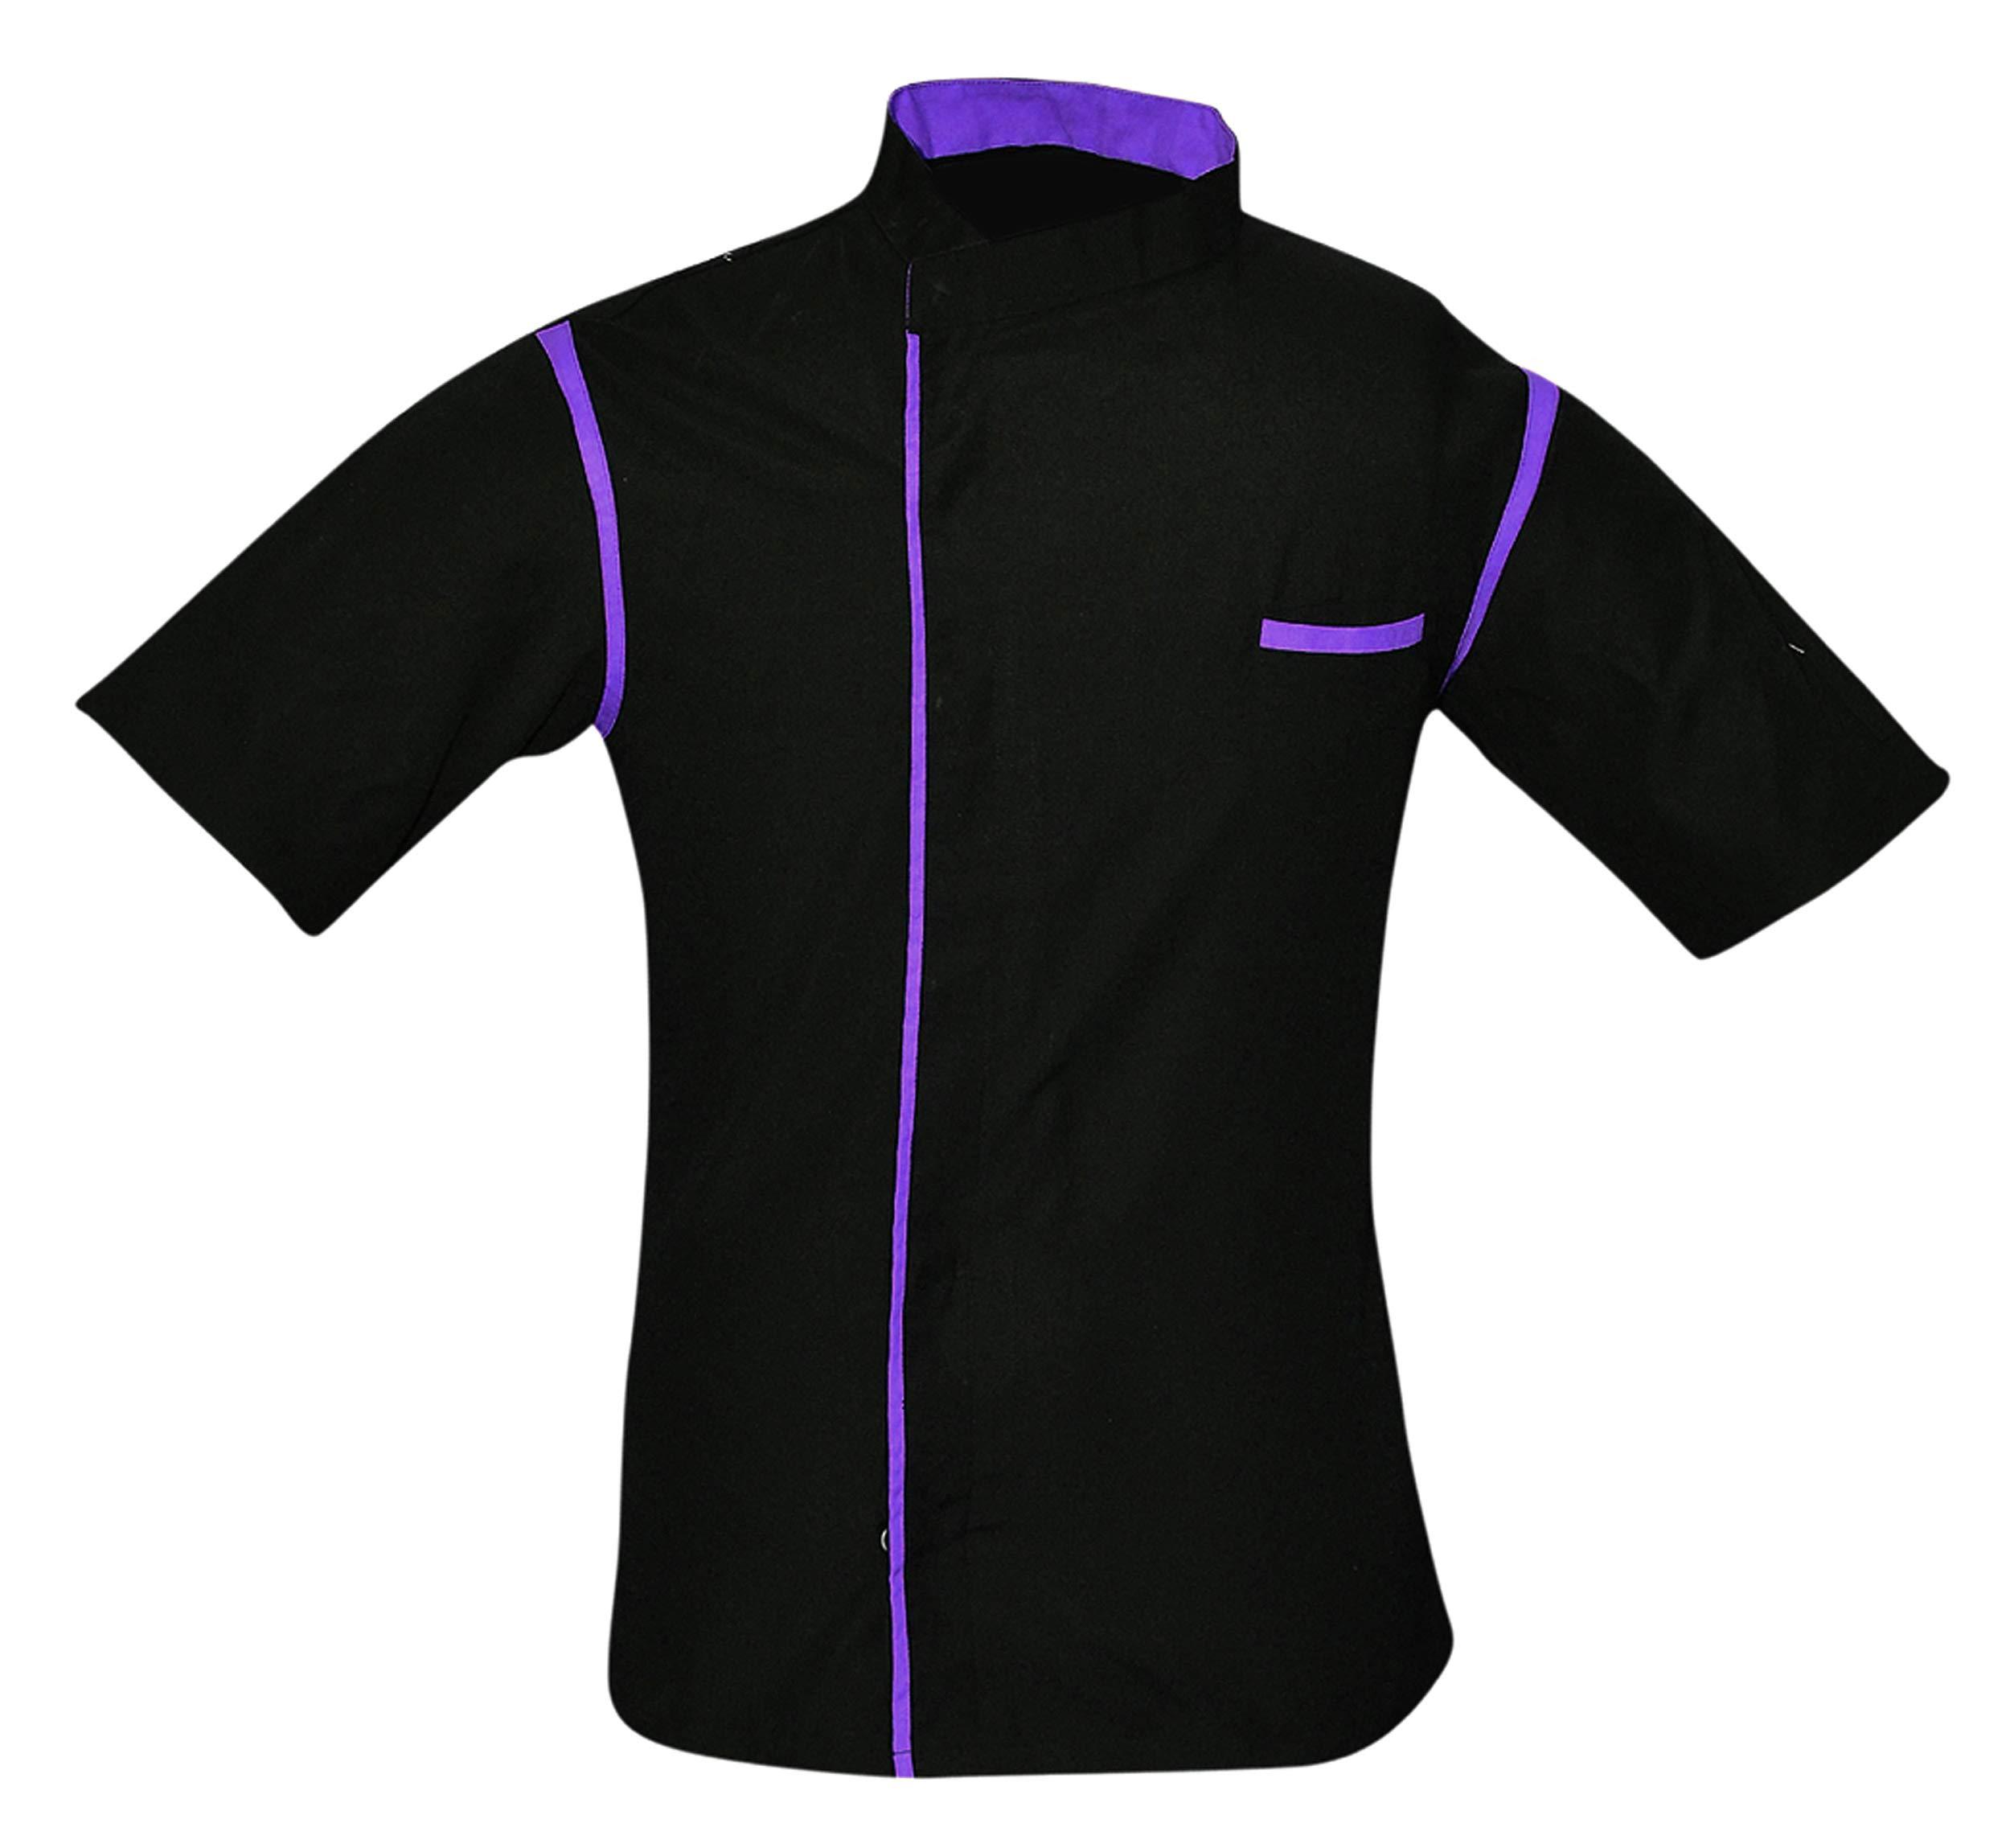 Leorenzo Creation HN-06 Men's Chef Coat with Purple Piping (Size- XXXXL, Black Colour)